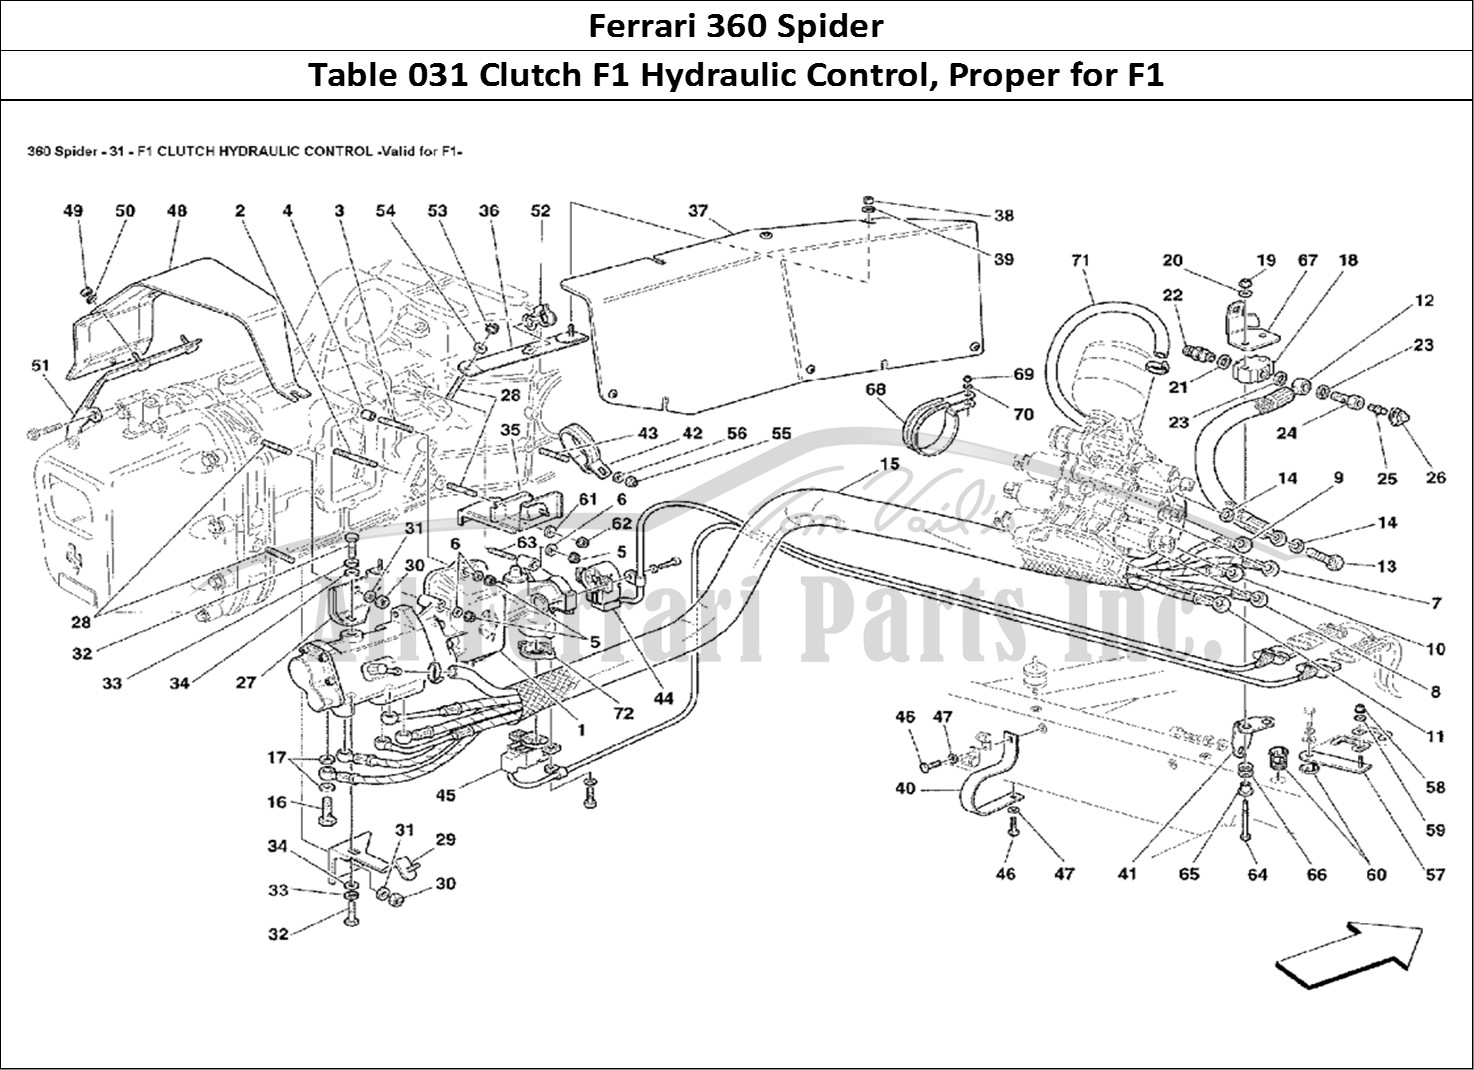 Buy Original Ferrari 360 Spider 031 Clutch F1 Hydraulic Control Proper For F1 Ferrari Parts